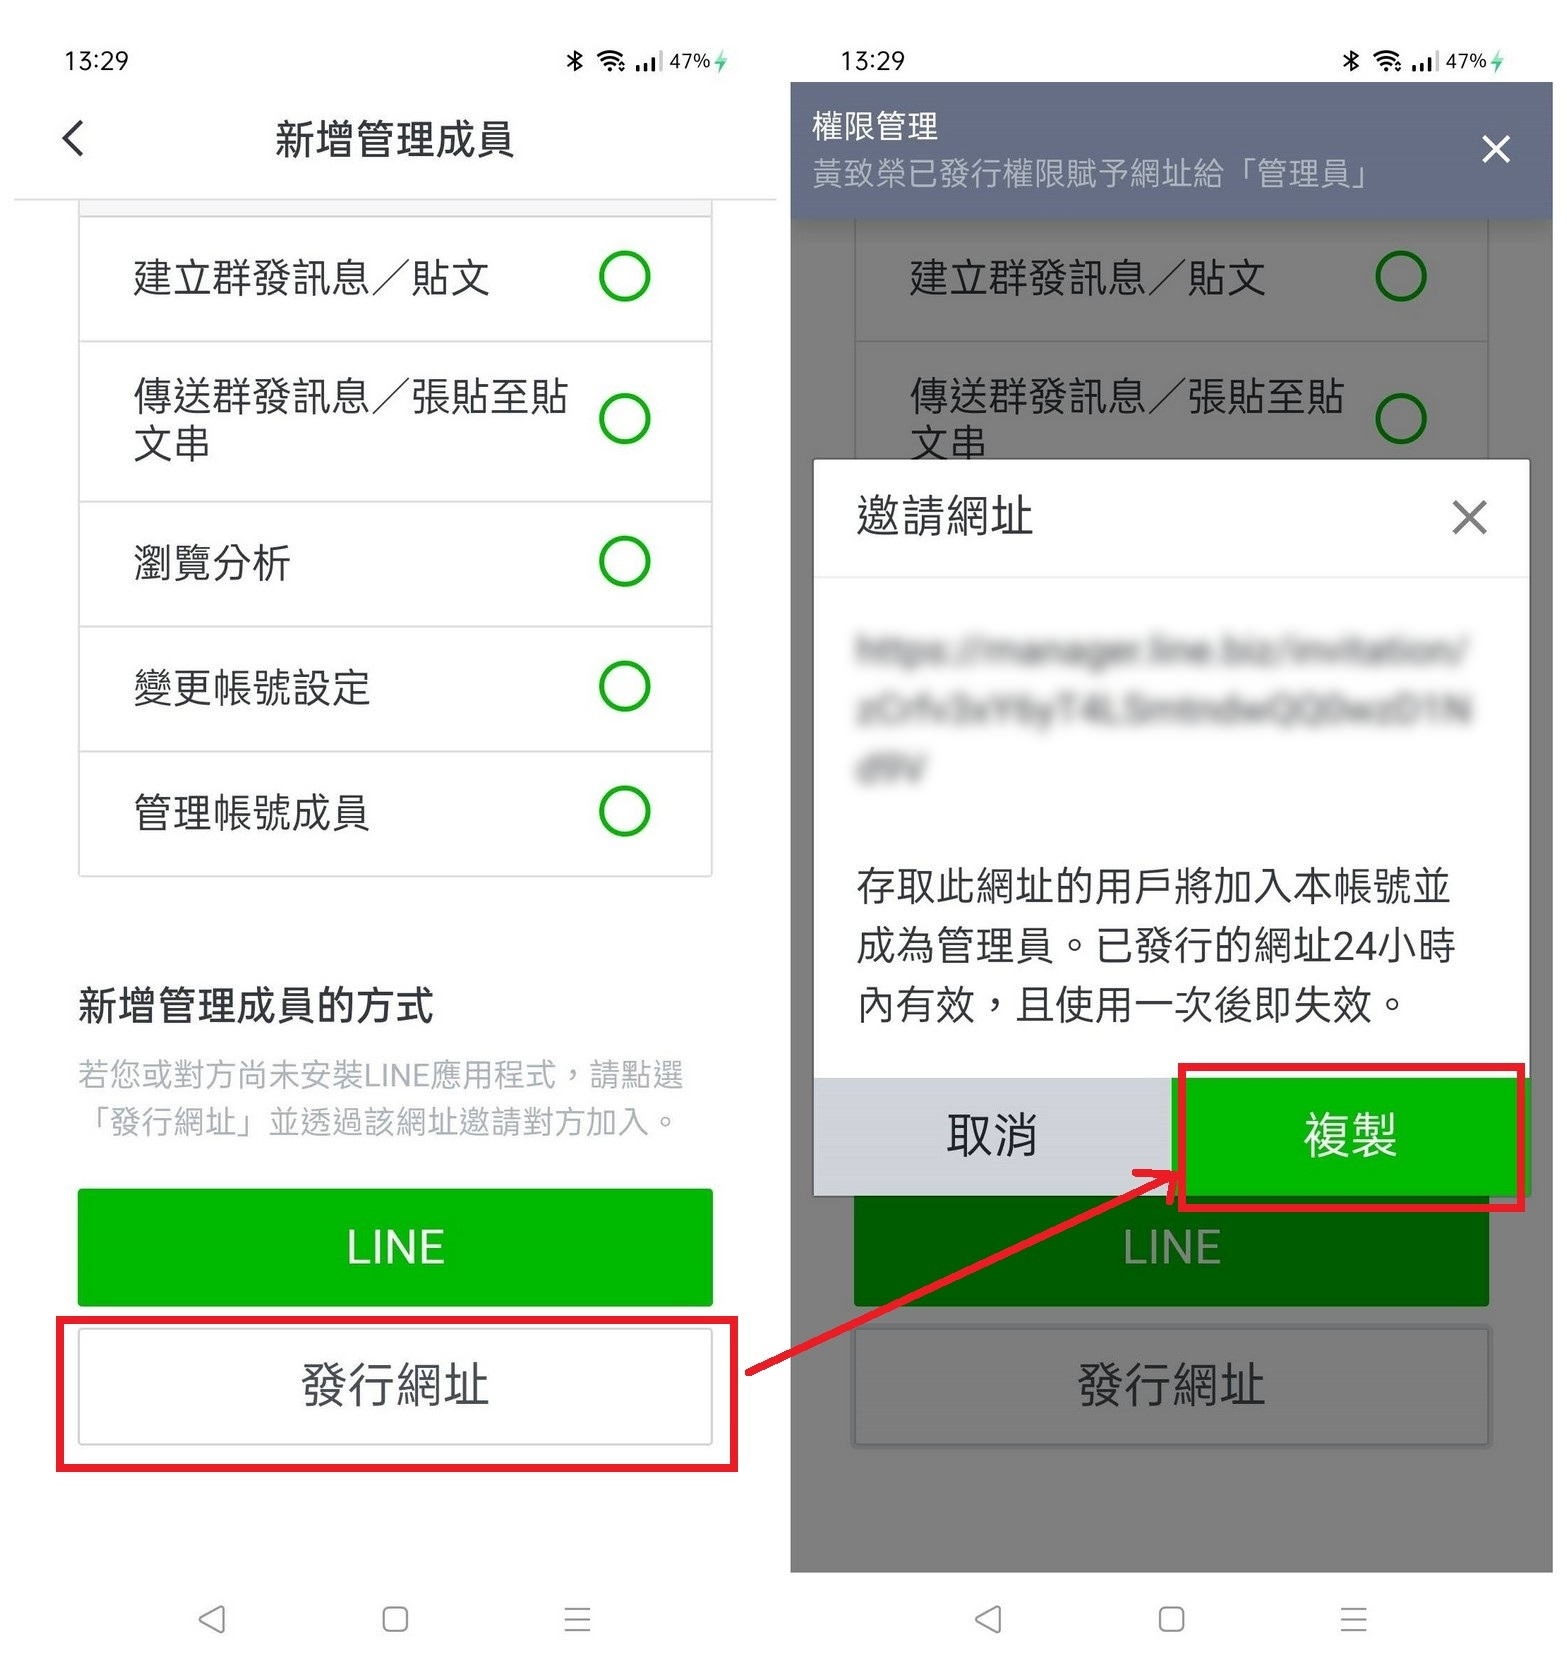 LINE Official Account (Line@)如何新增管理員 讓多位小編一起管理